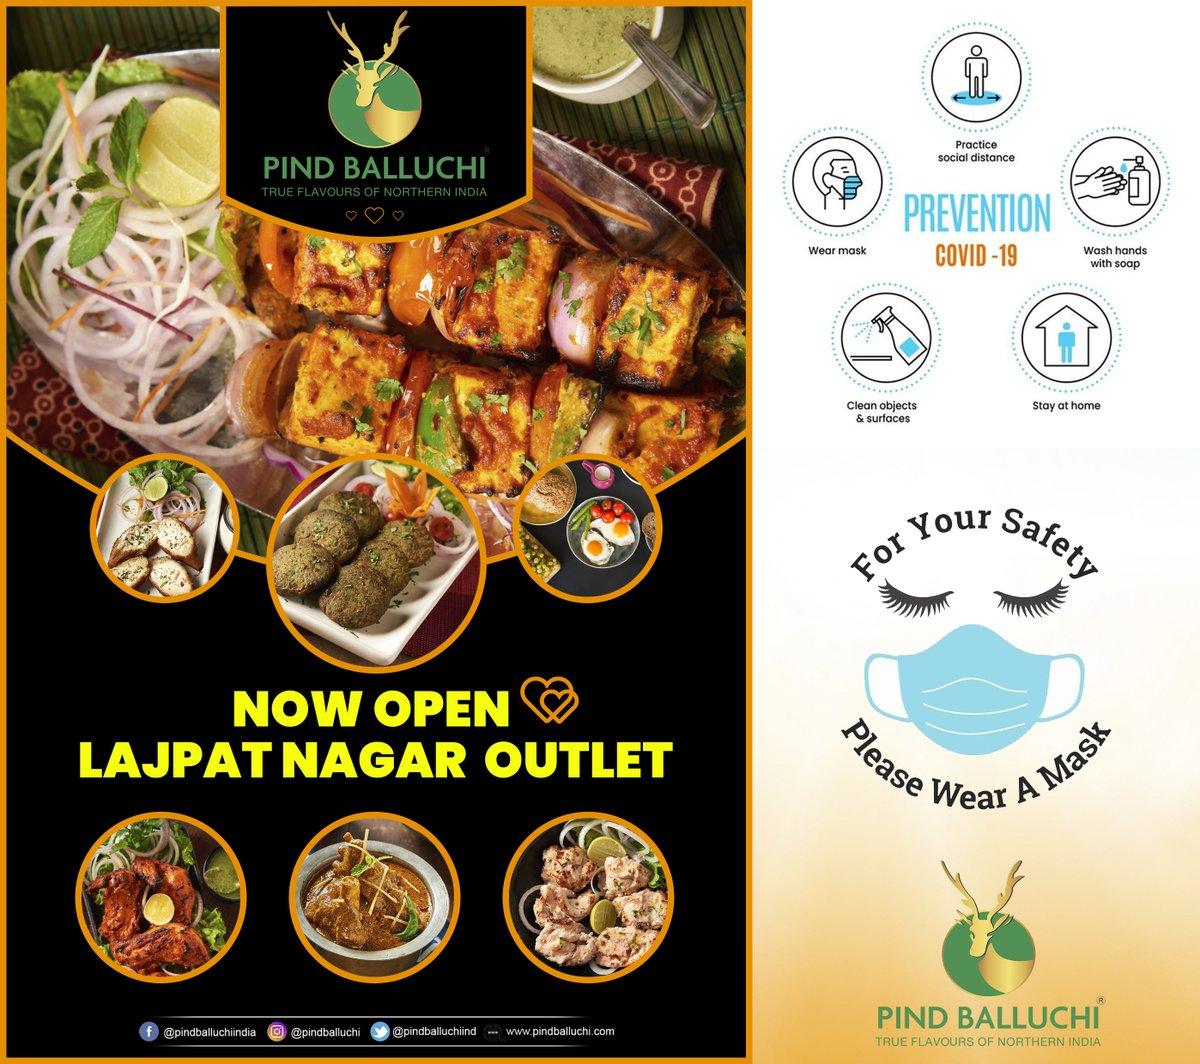 Now Open Lajpat Nagar #food #foodie #vegetarian #healthyfood #healthyfoodie #eatwell #veganrecipes #familytime #indianfood #healthyfoodlover #OrderOnline #PindBalluchipic.twitter.com/Uyvceb4nhe